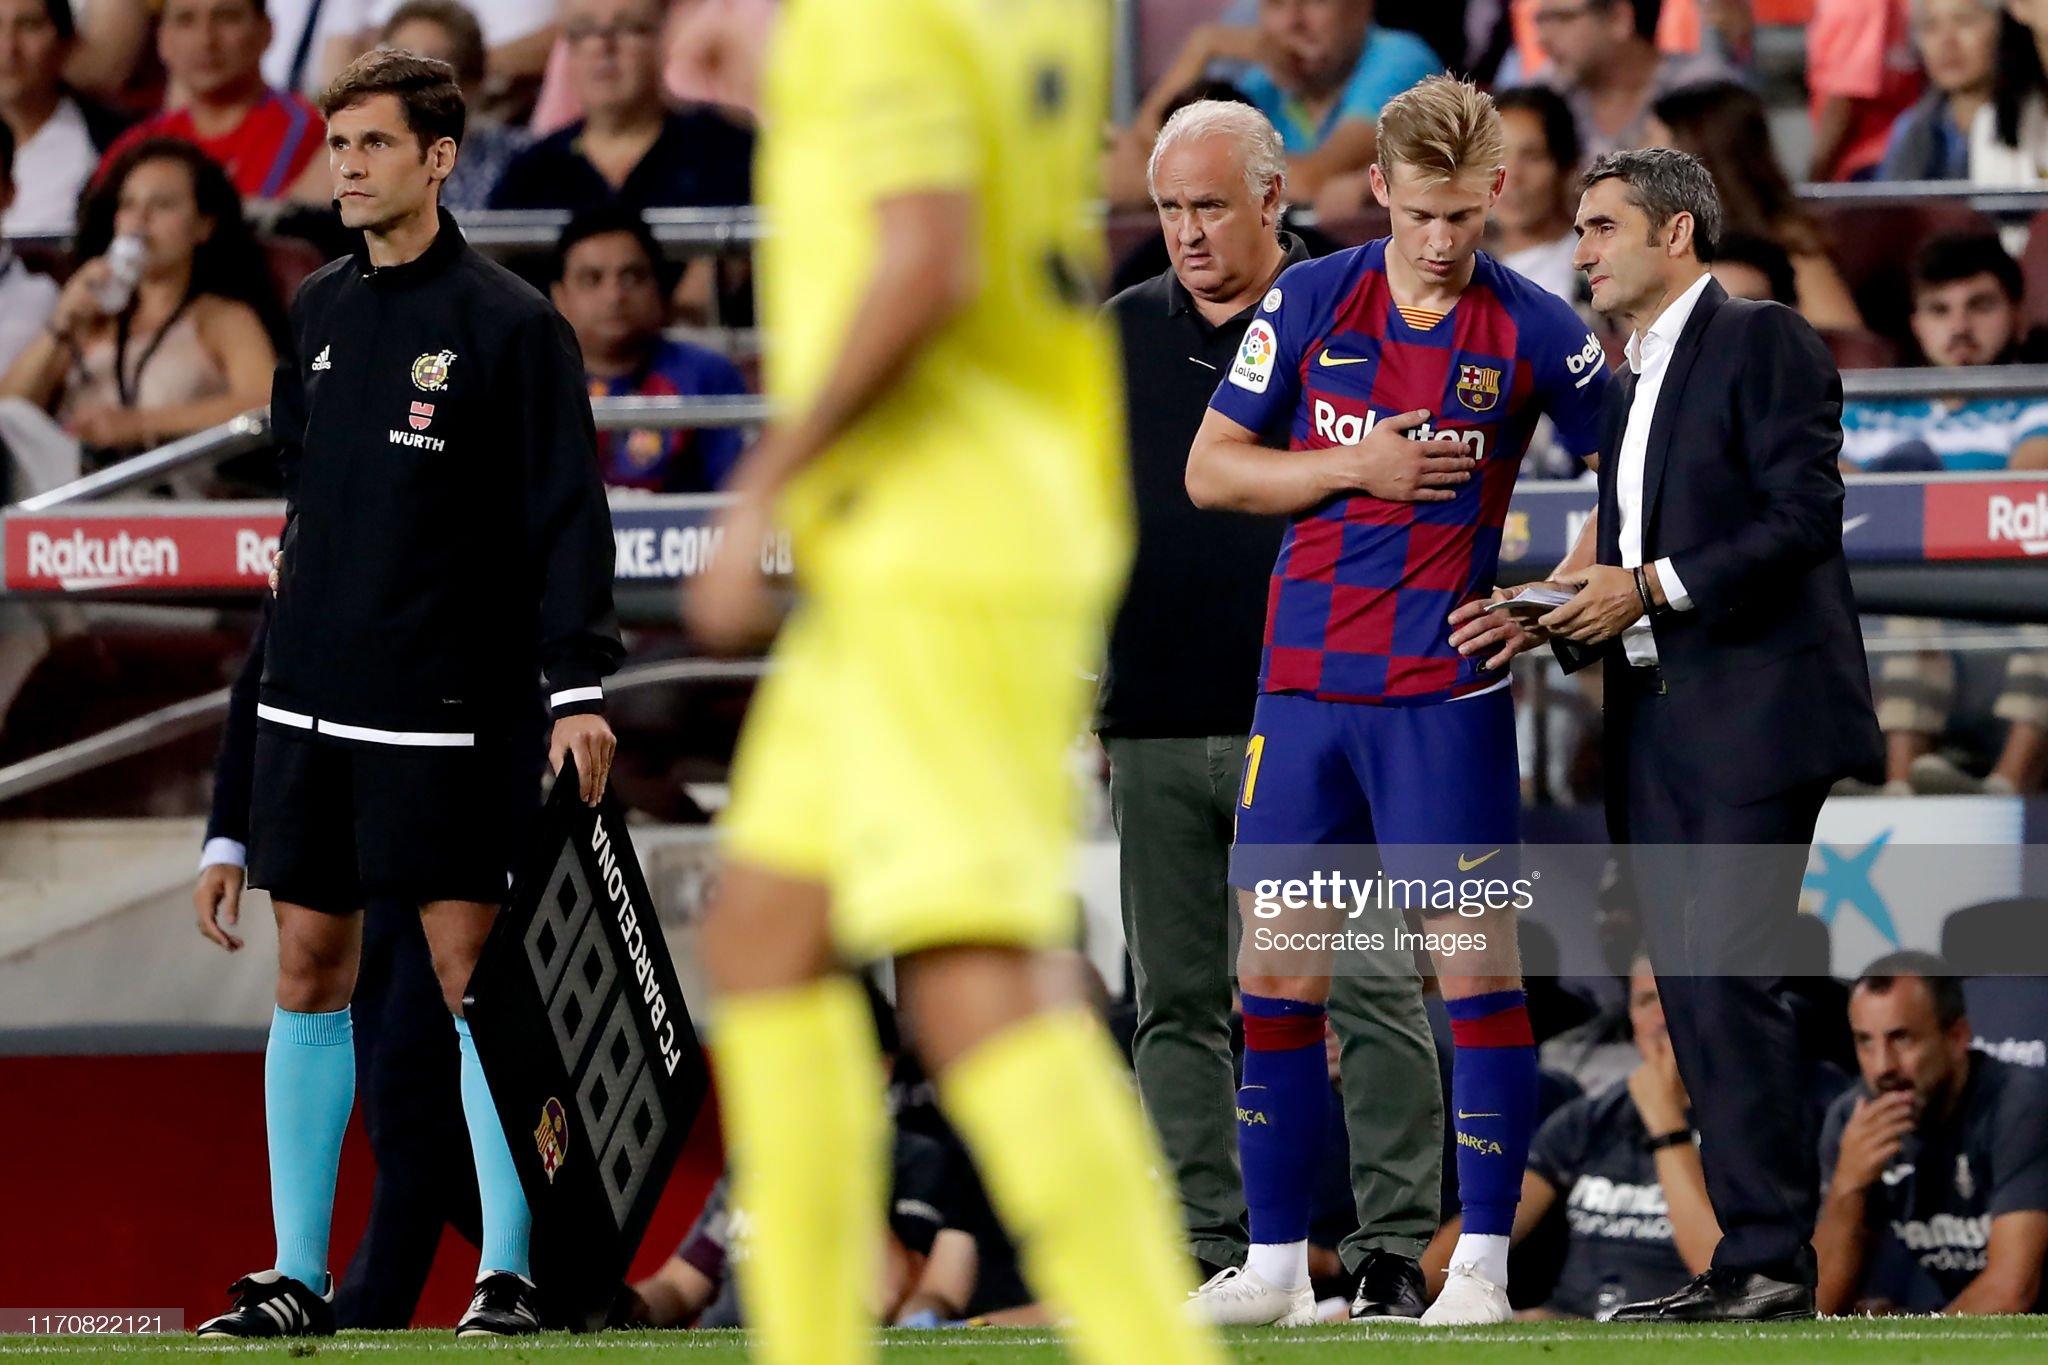 صور مباراة : برشلونة - فياريال 2-1 ( 24-09-2019 )  Frenkie-de-jong-of-fc-barcelona-coach-ernesto-valverde-of-fc-during-picture-id1170822121?s=2048x2048